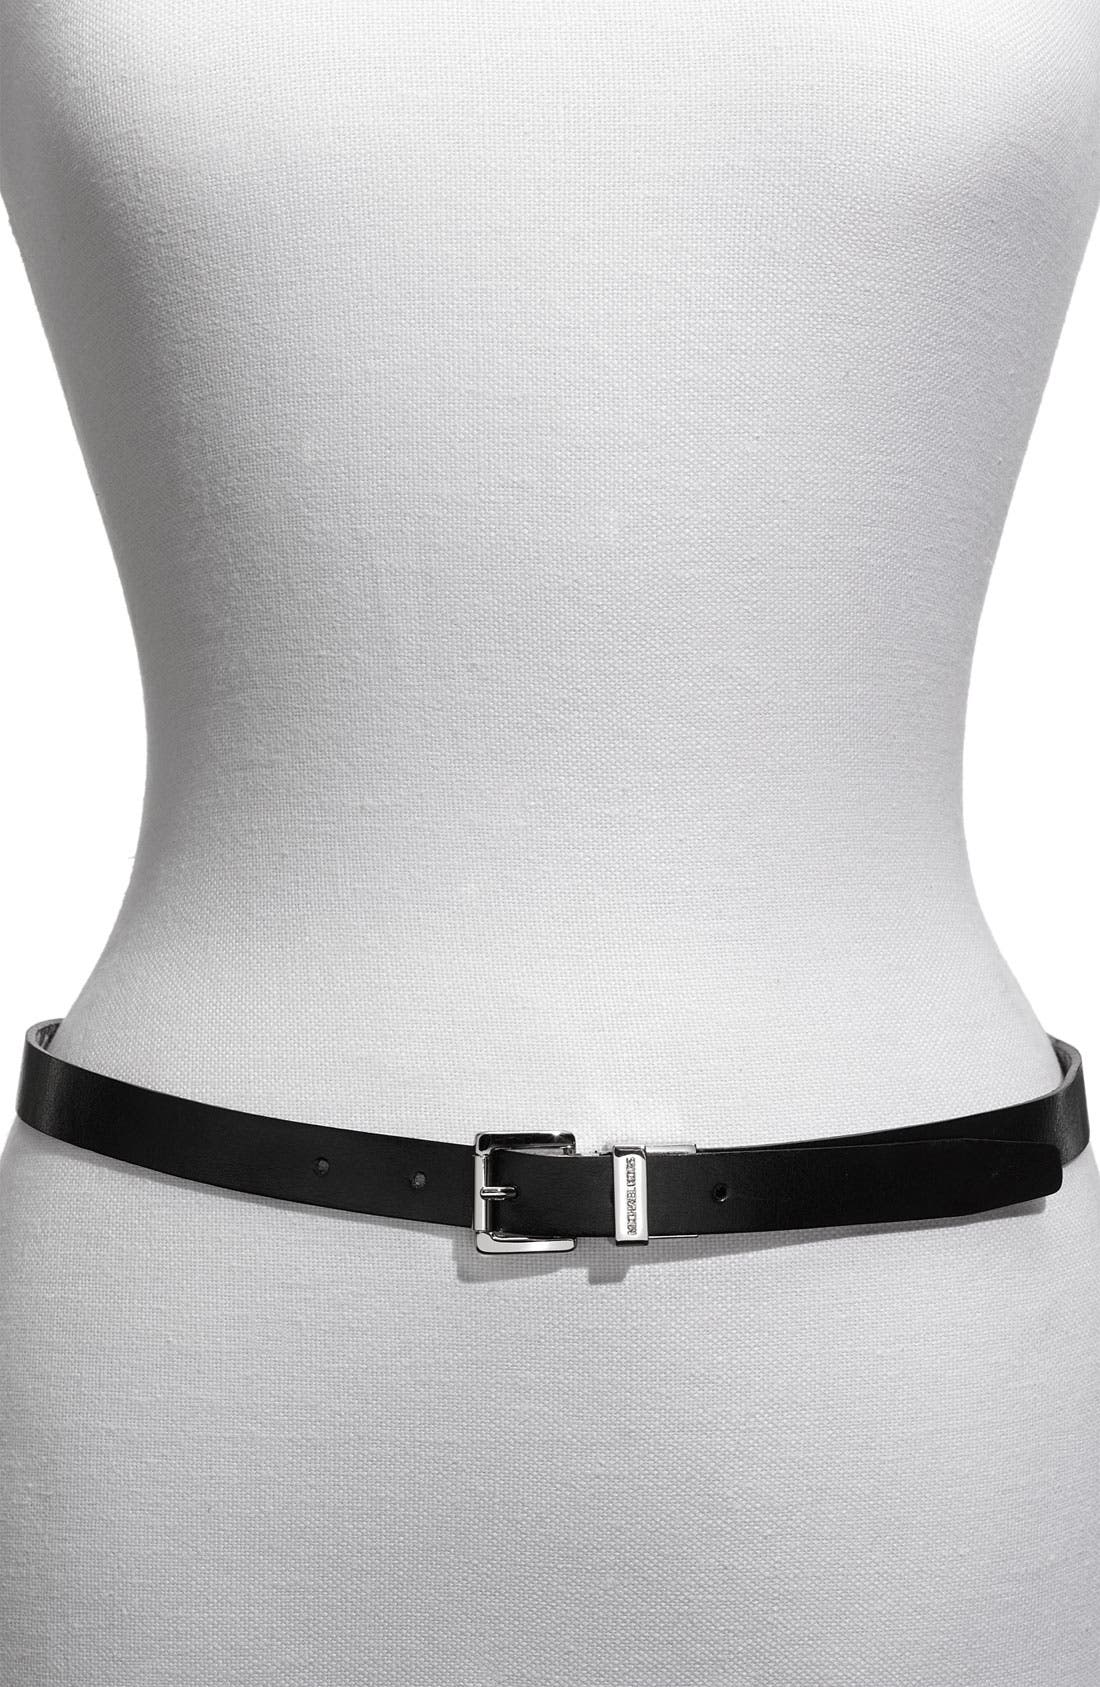 Alternate Image 2  - MICHAEL Michael Kors Reversible Belt